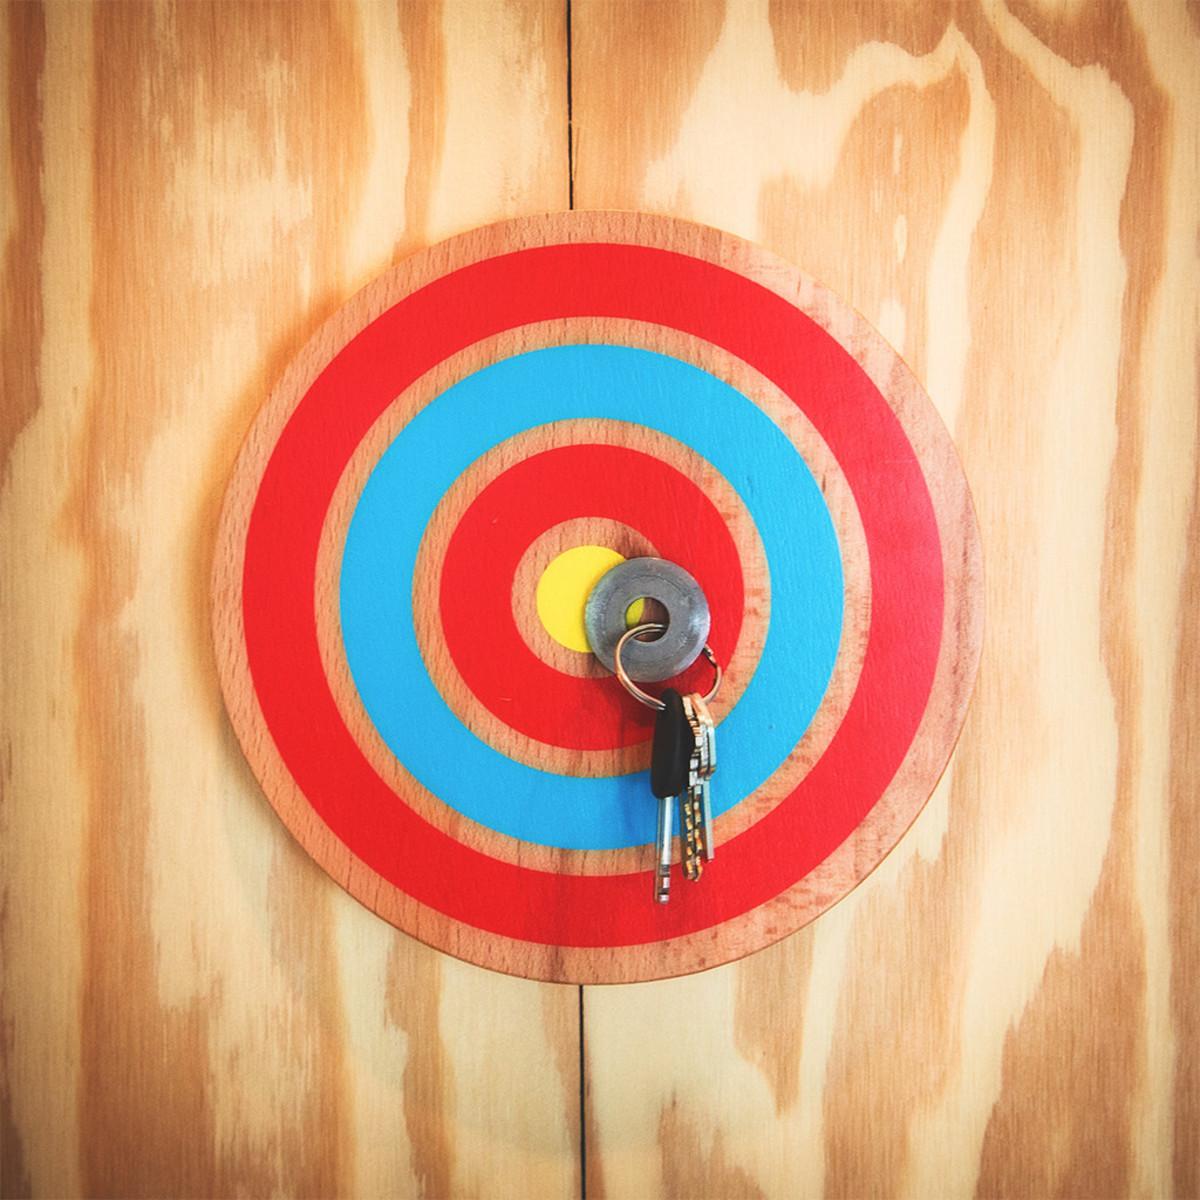 key-target-4_1024x1024